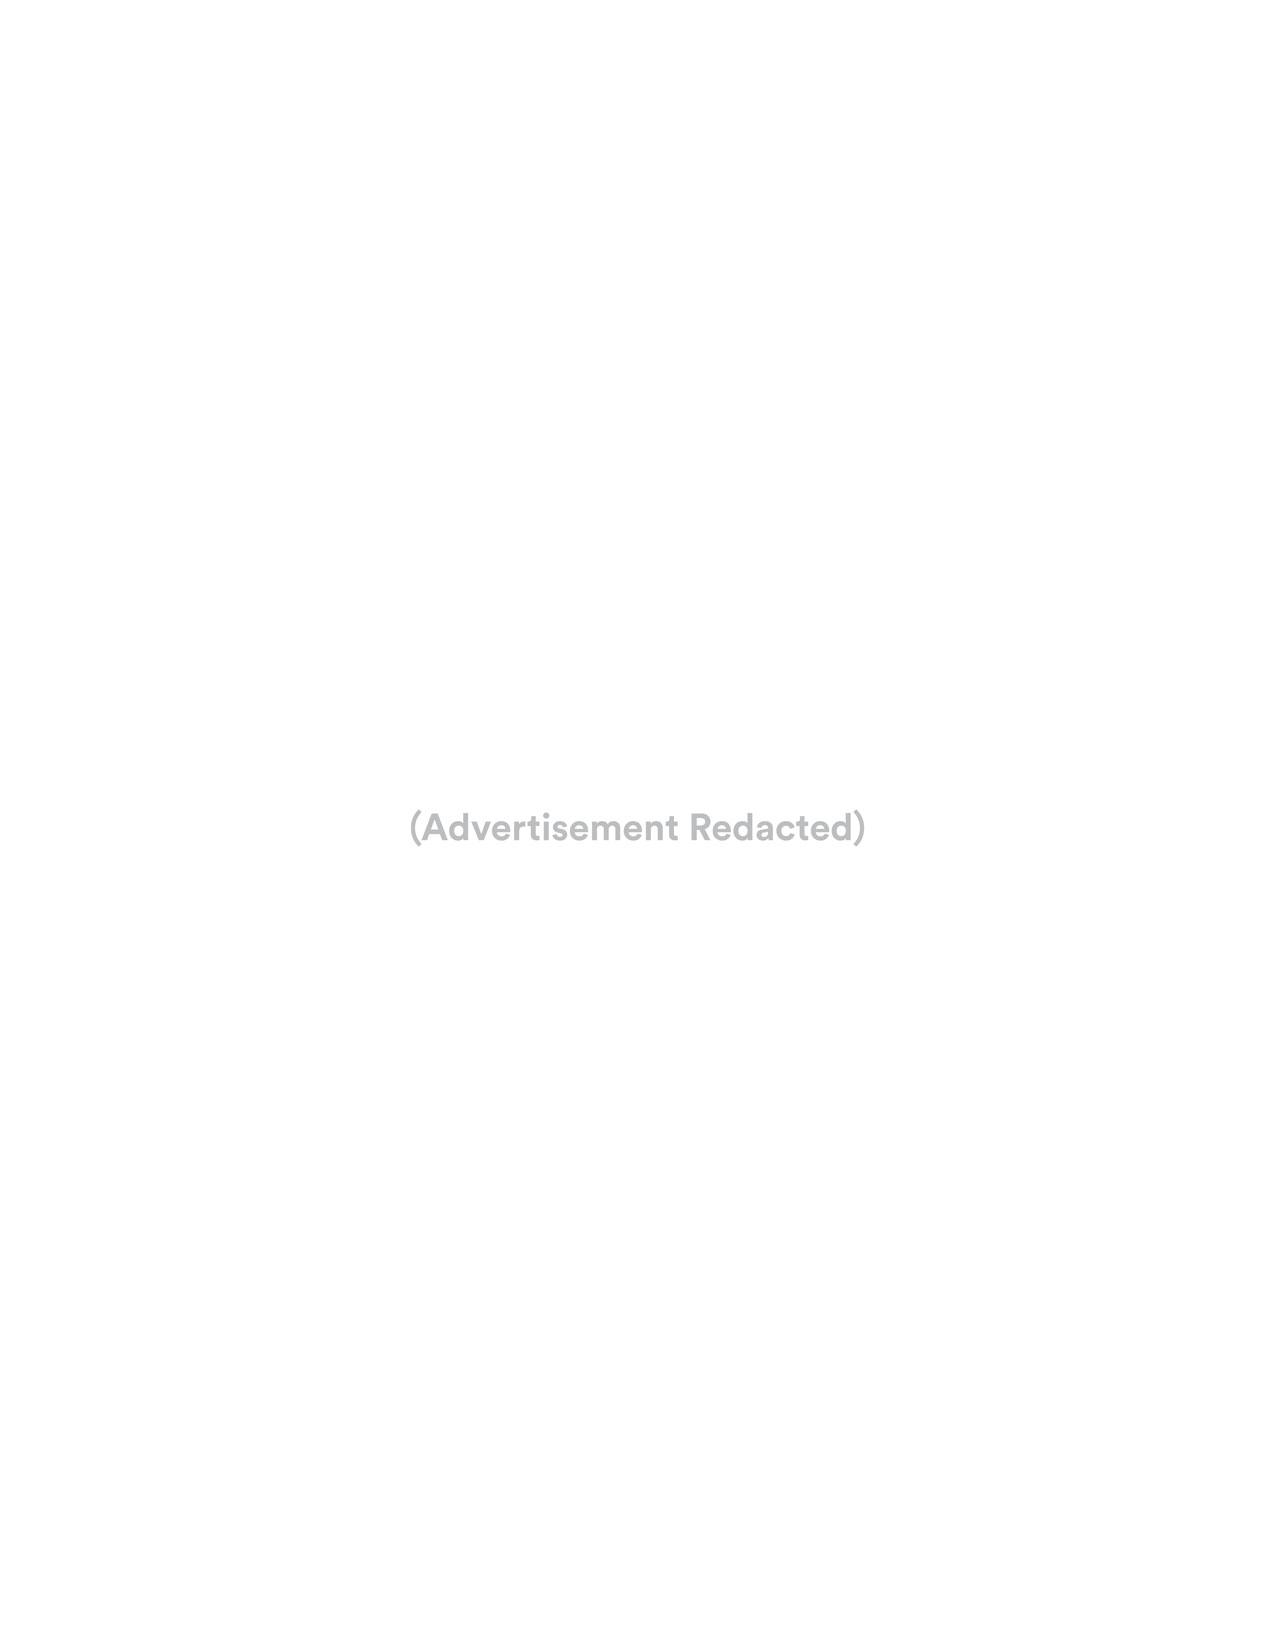 HARKERISSUE2-Spreads-19.jpg